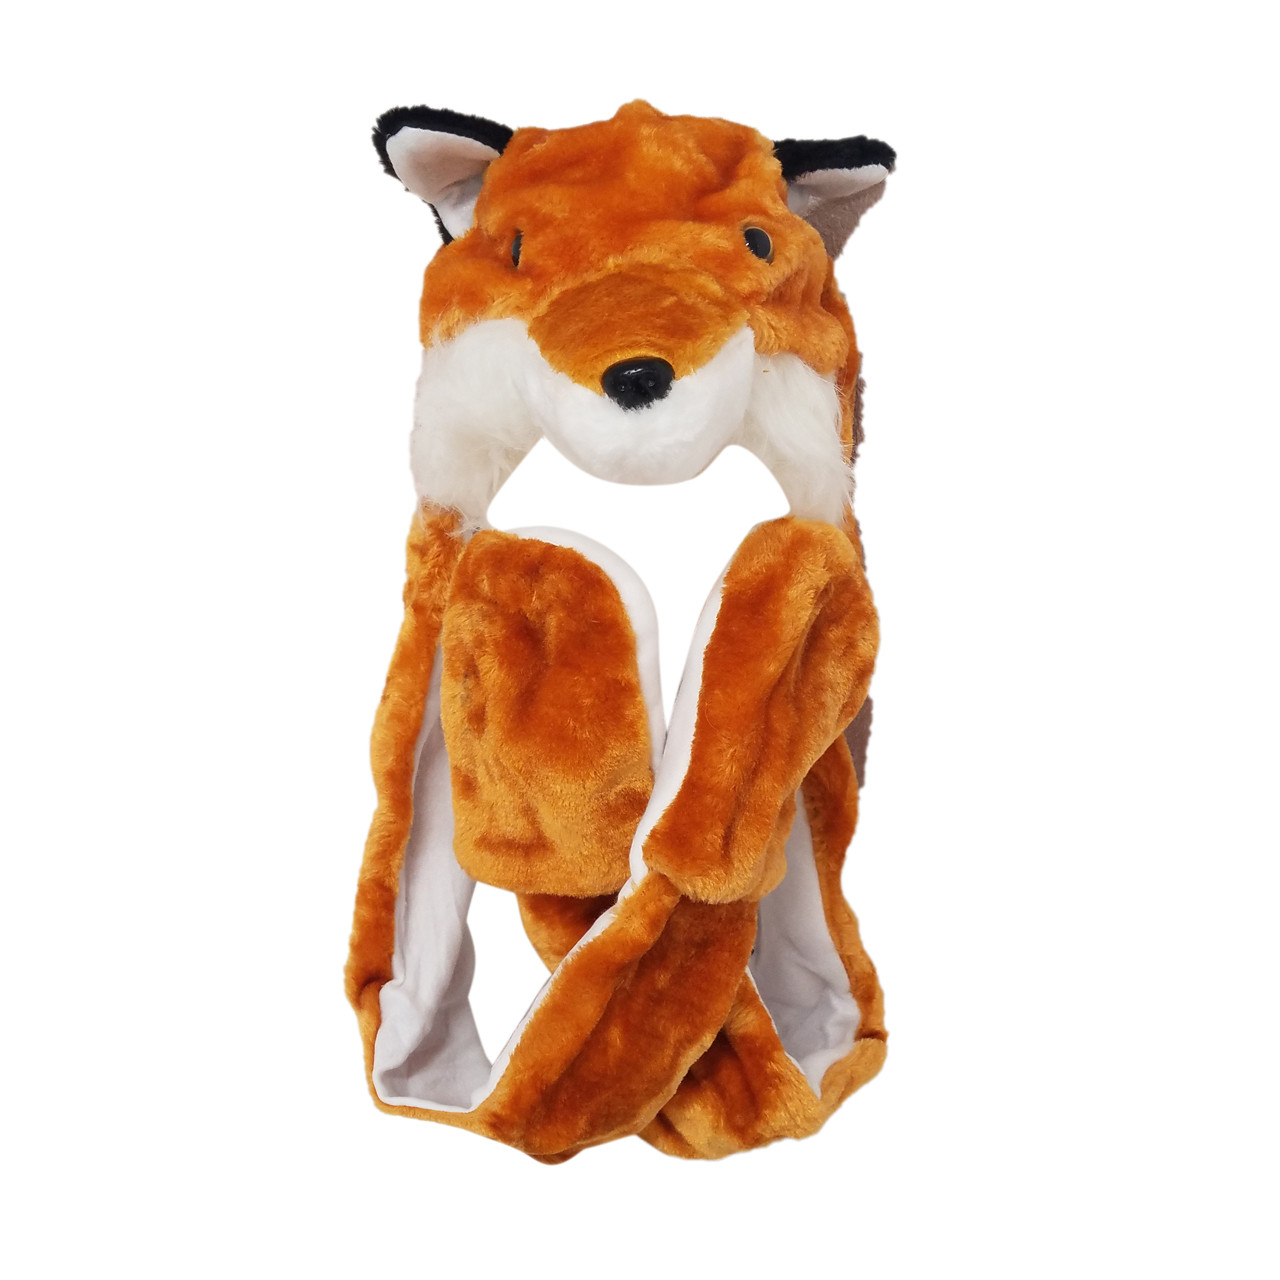 dc49895784c Fox animal hat a long arms with mittens wholesale llc jpg 1280x1280 Fox  animal hat